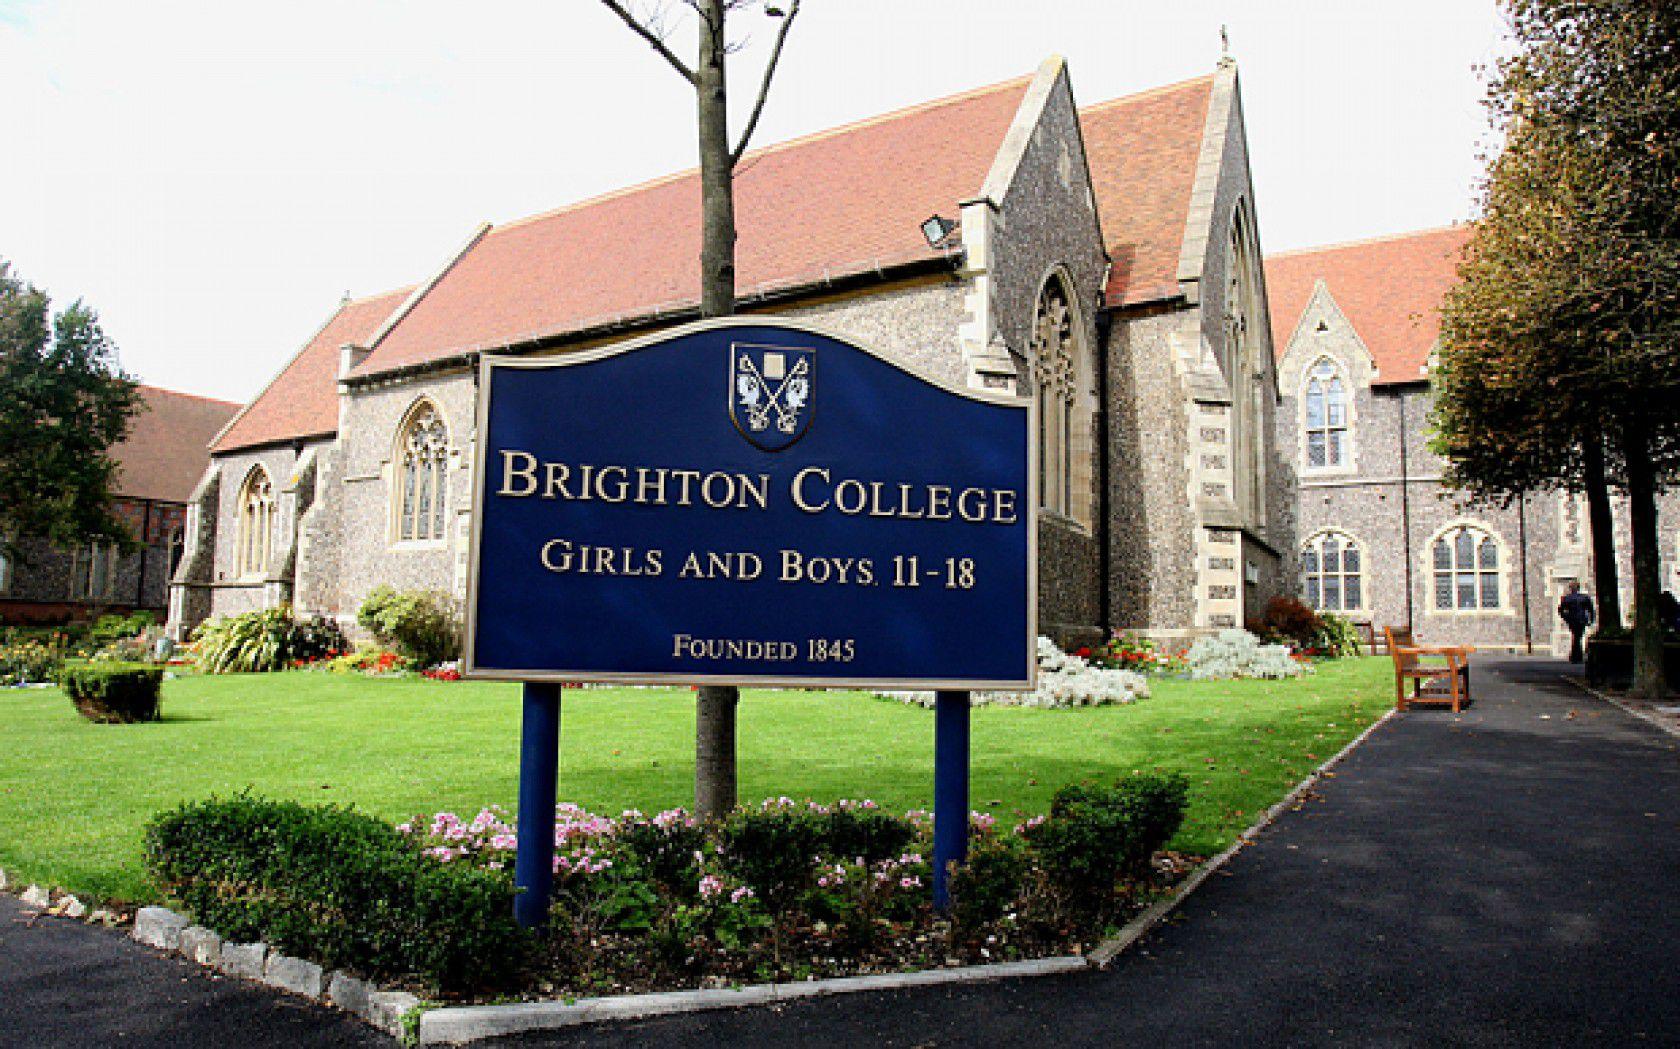 İNGİLTERE'NİN EN İYİ ÖZEL OKULLARINDAN BRIGHTON SCHOOL